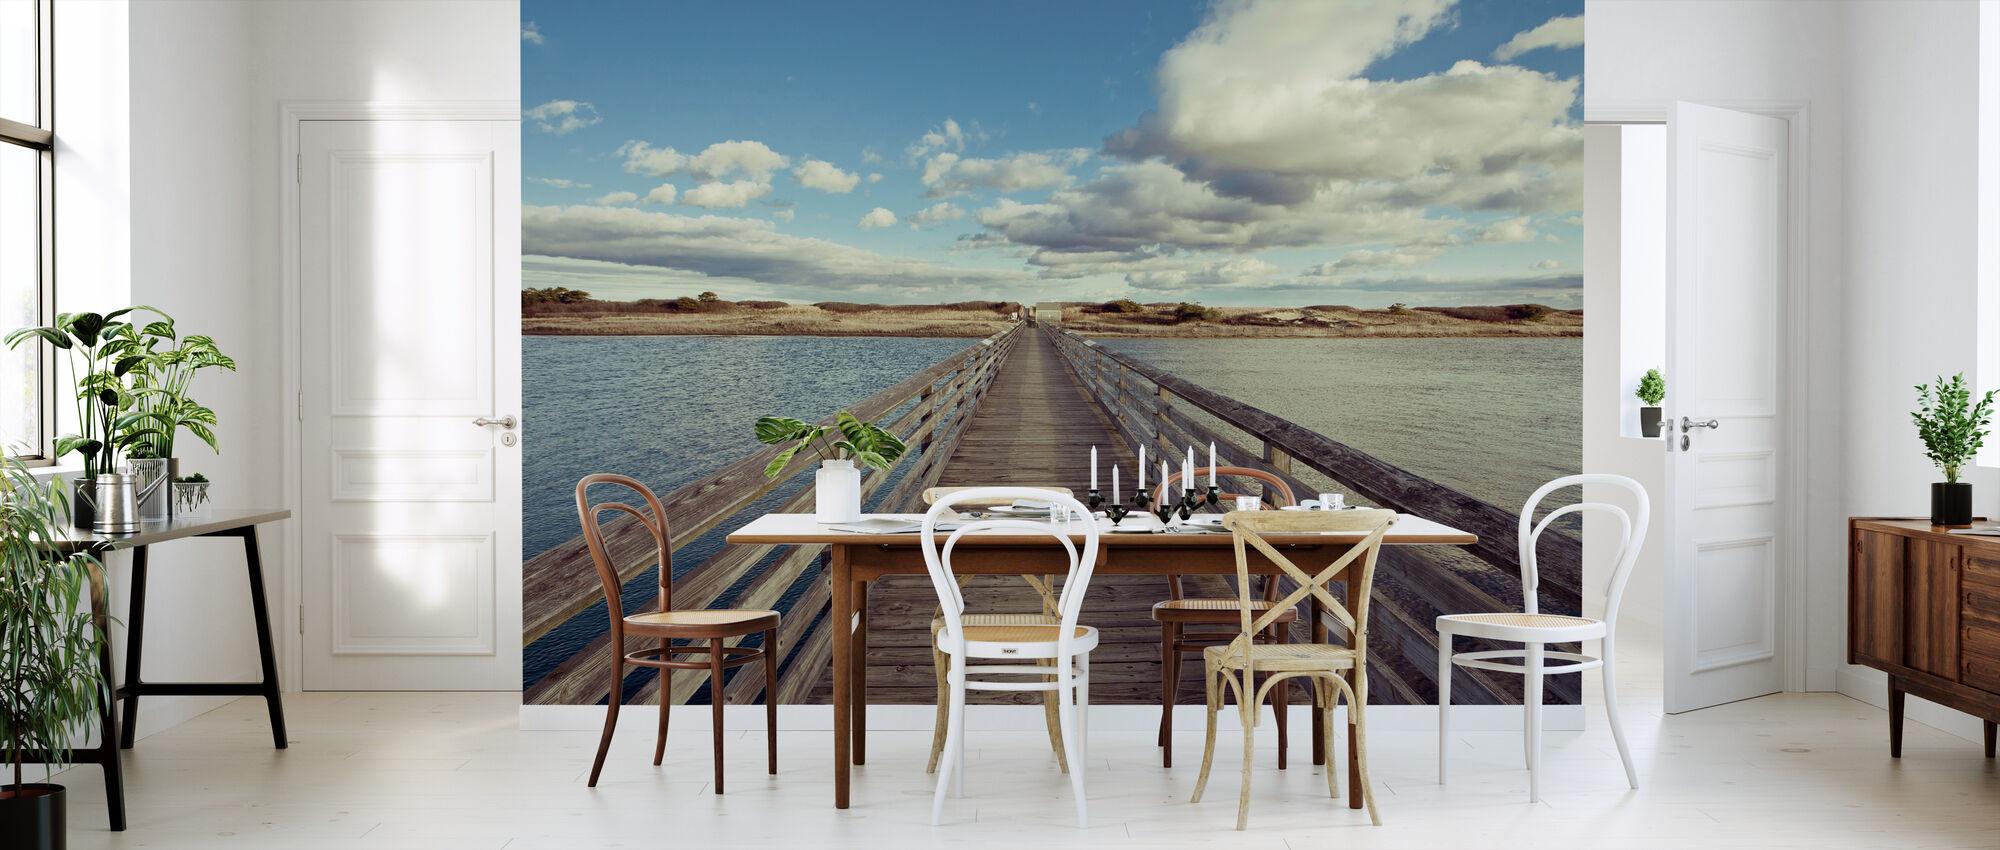 Bridge to the Beach - Wallpaper - Kitchen